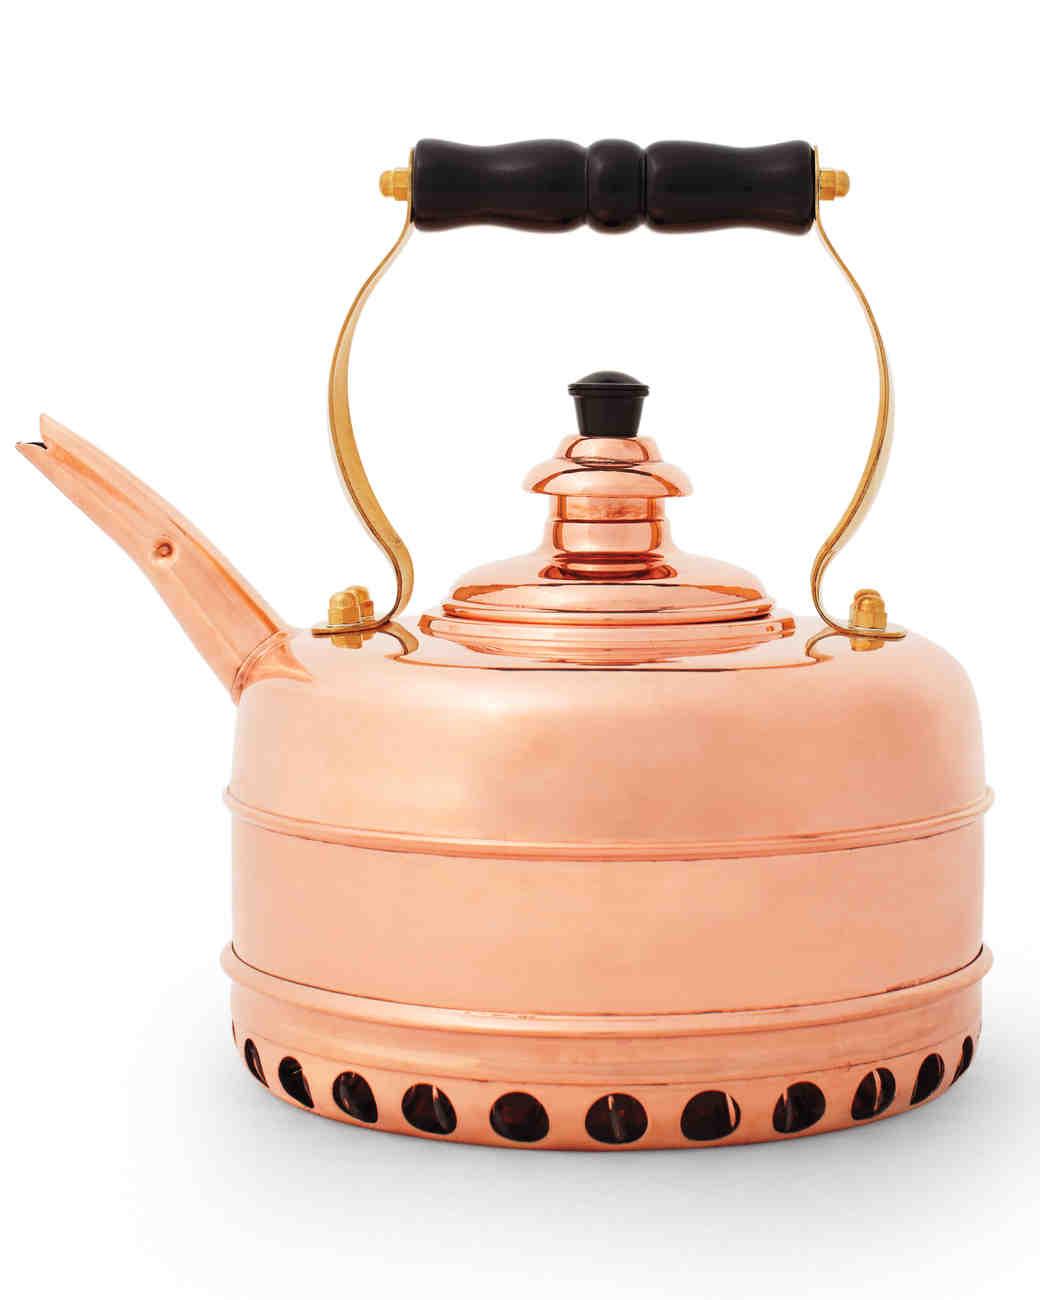 simplex-tea-kettle-079-mwd110609.jpg